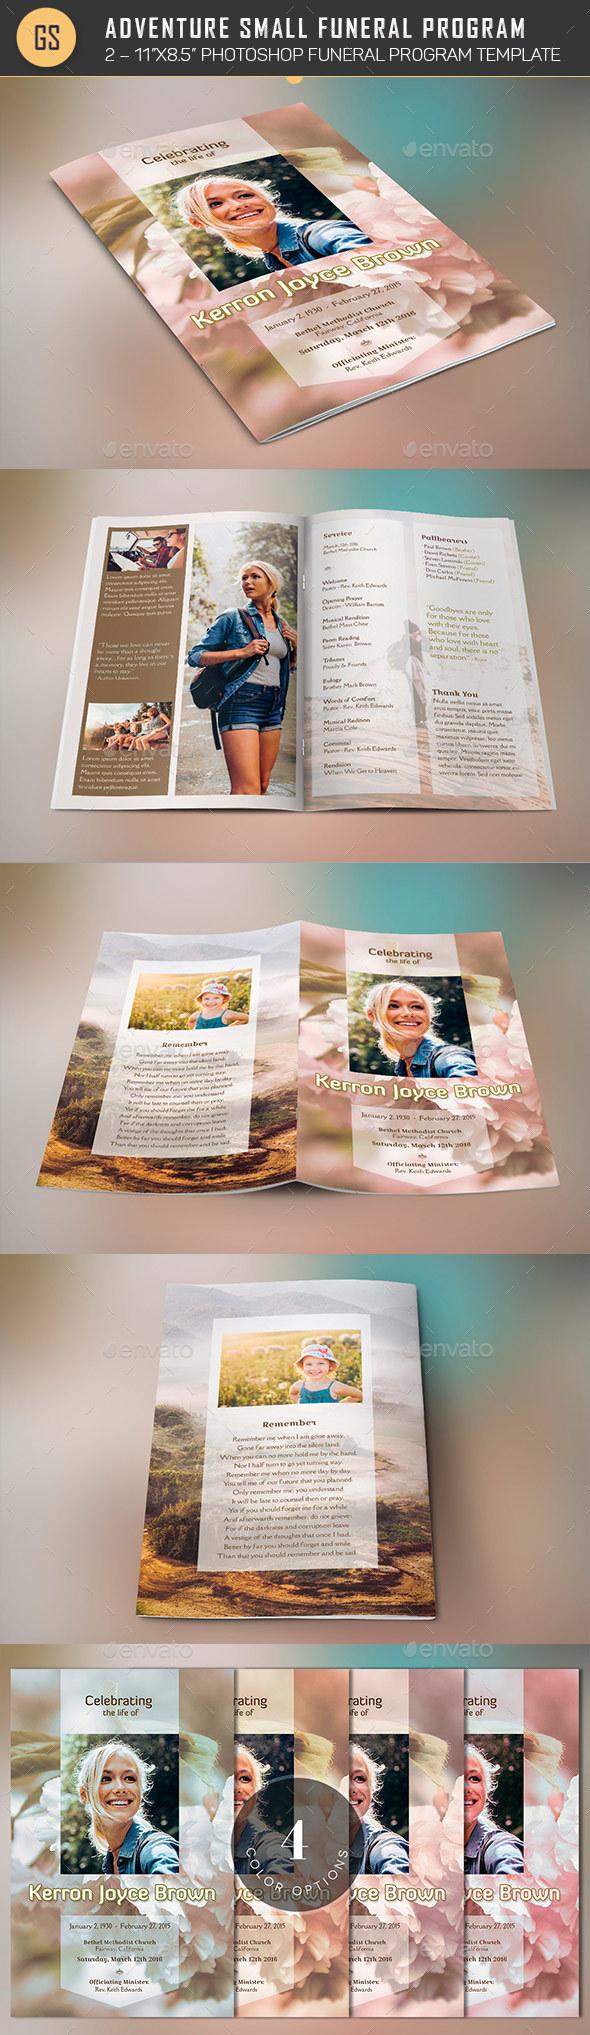 Adventure Small Funeral Program Template - Informational Brochures